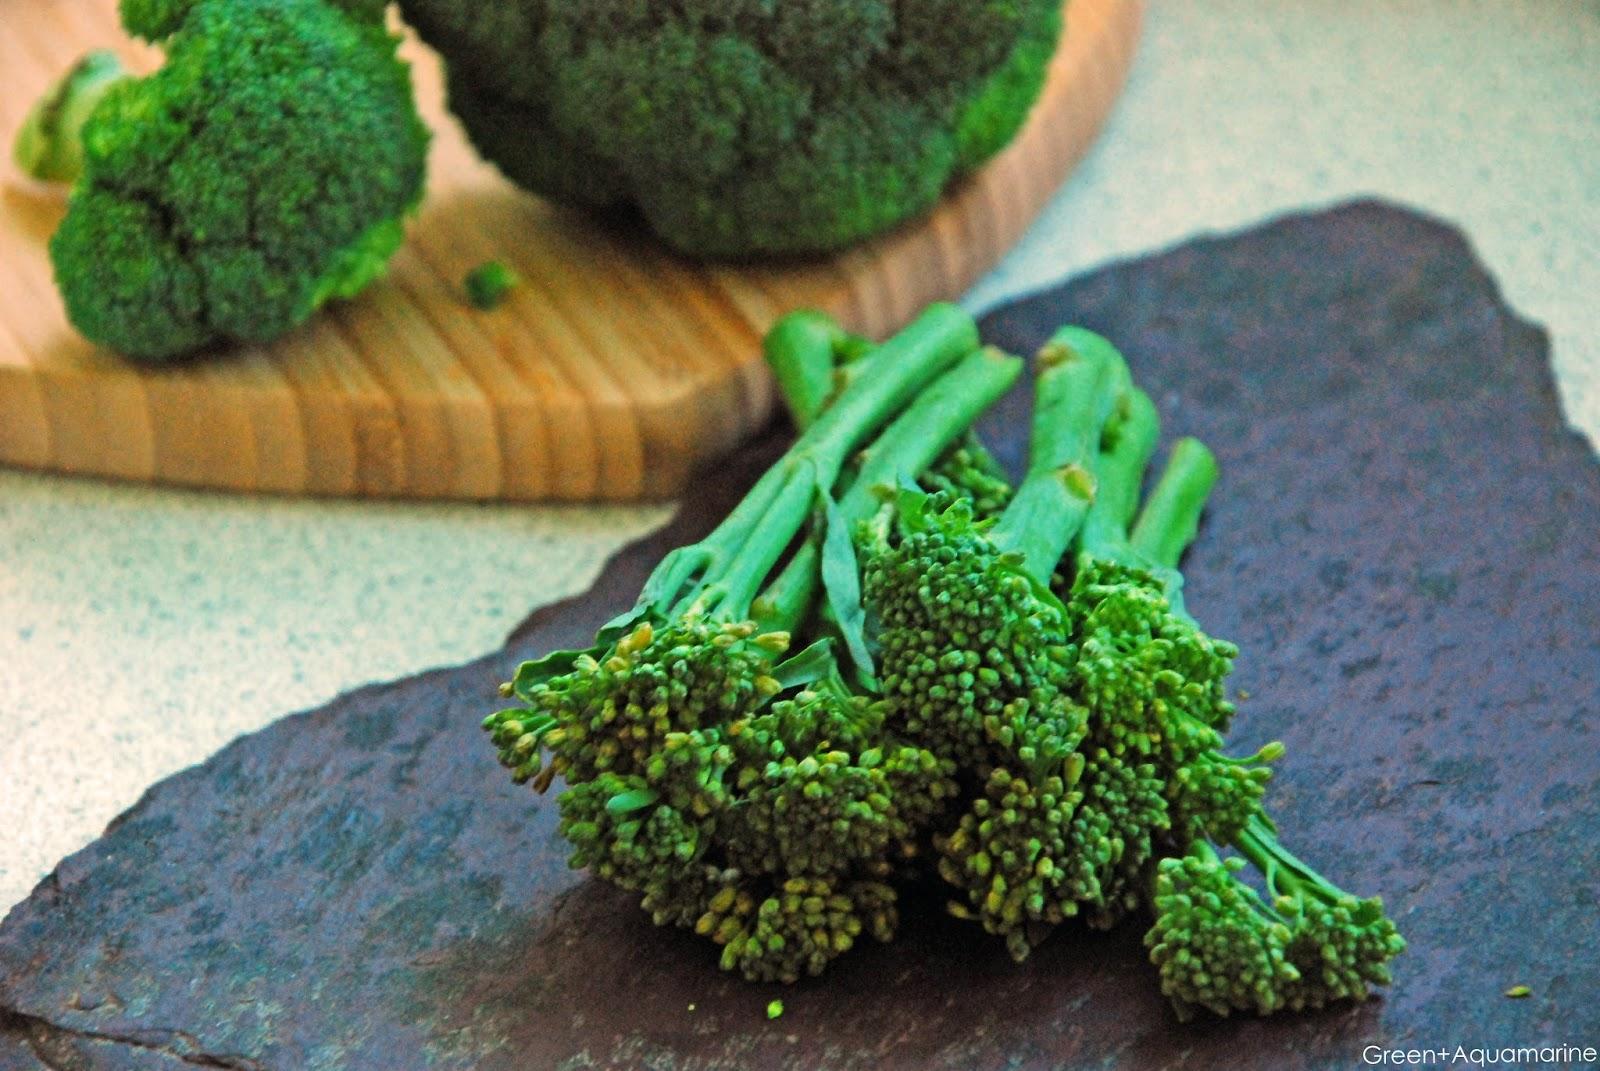 Tenderstem vs normal broccoli nutrition, superfood